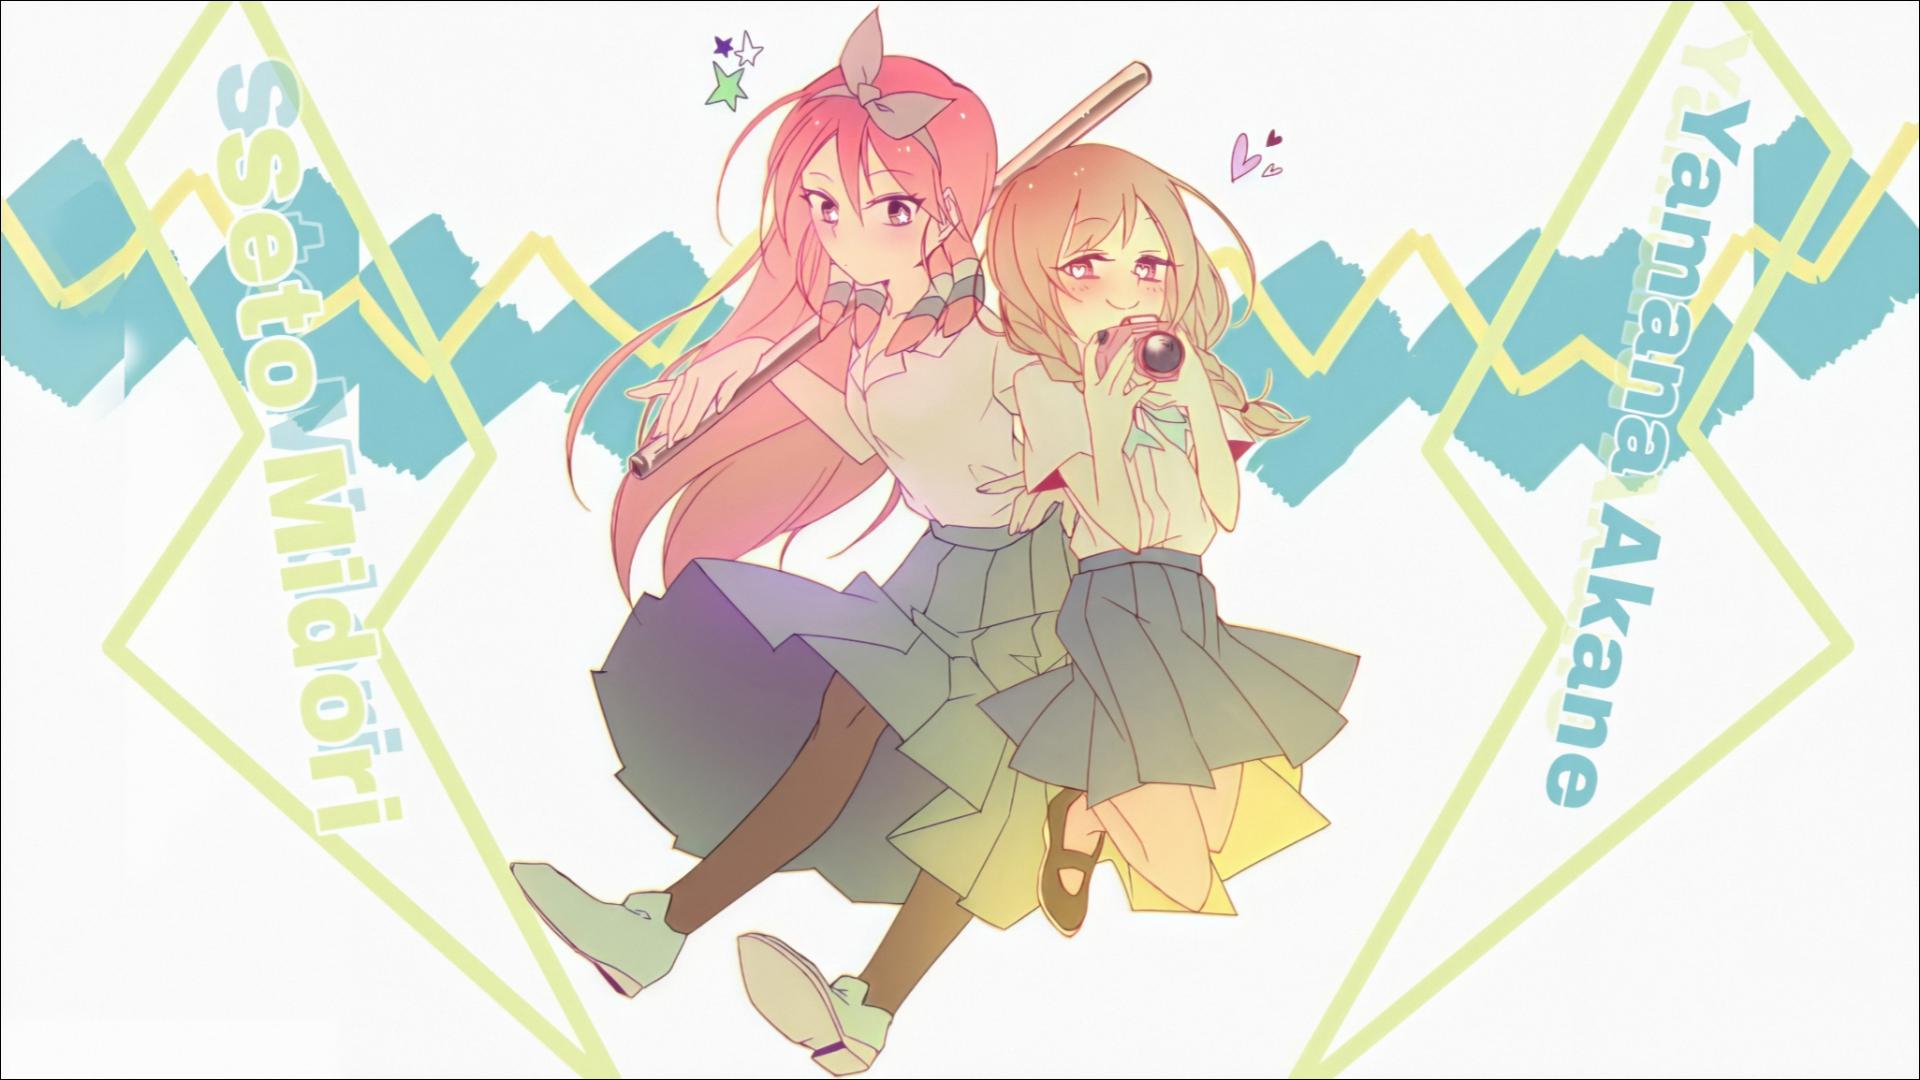 Wallpaper Anime Girls Inazuma Eleven Waifu2x 1920x1080 Gzilla 1936335 Hd Wallpapers Wallhere